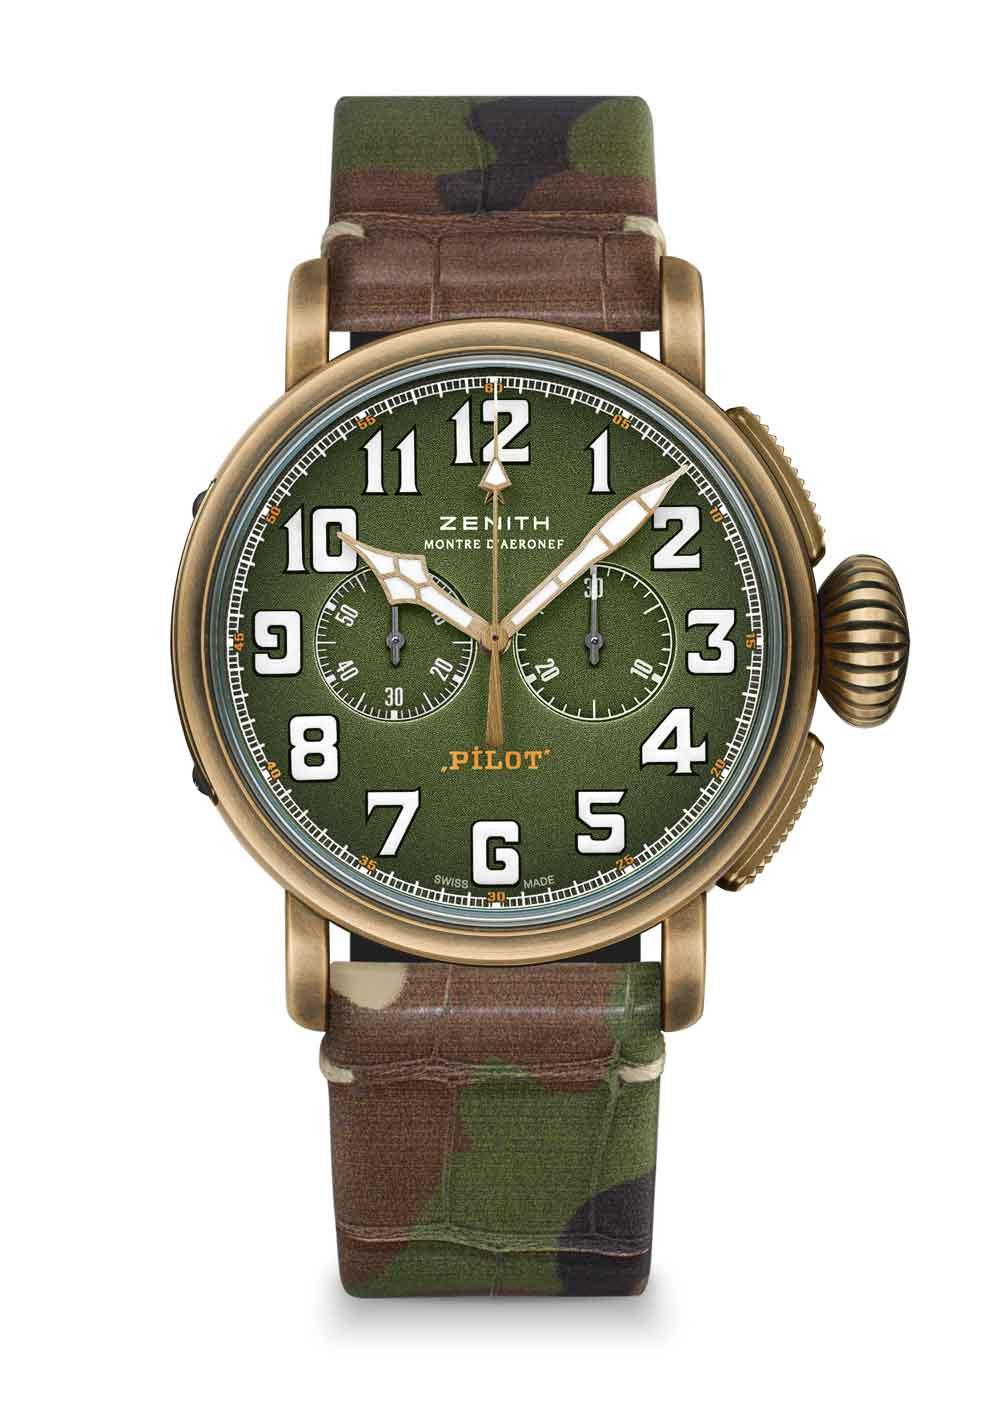 Reloj Zenith Pilot Type 20 Adventure